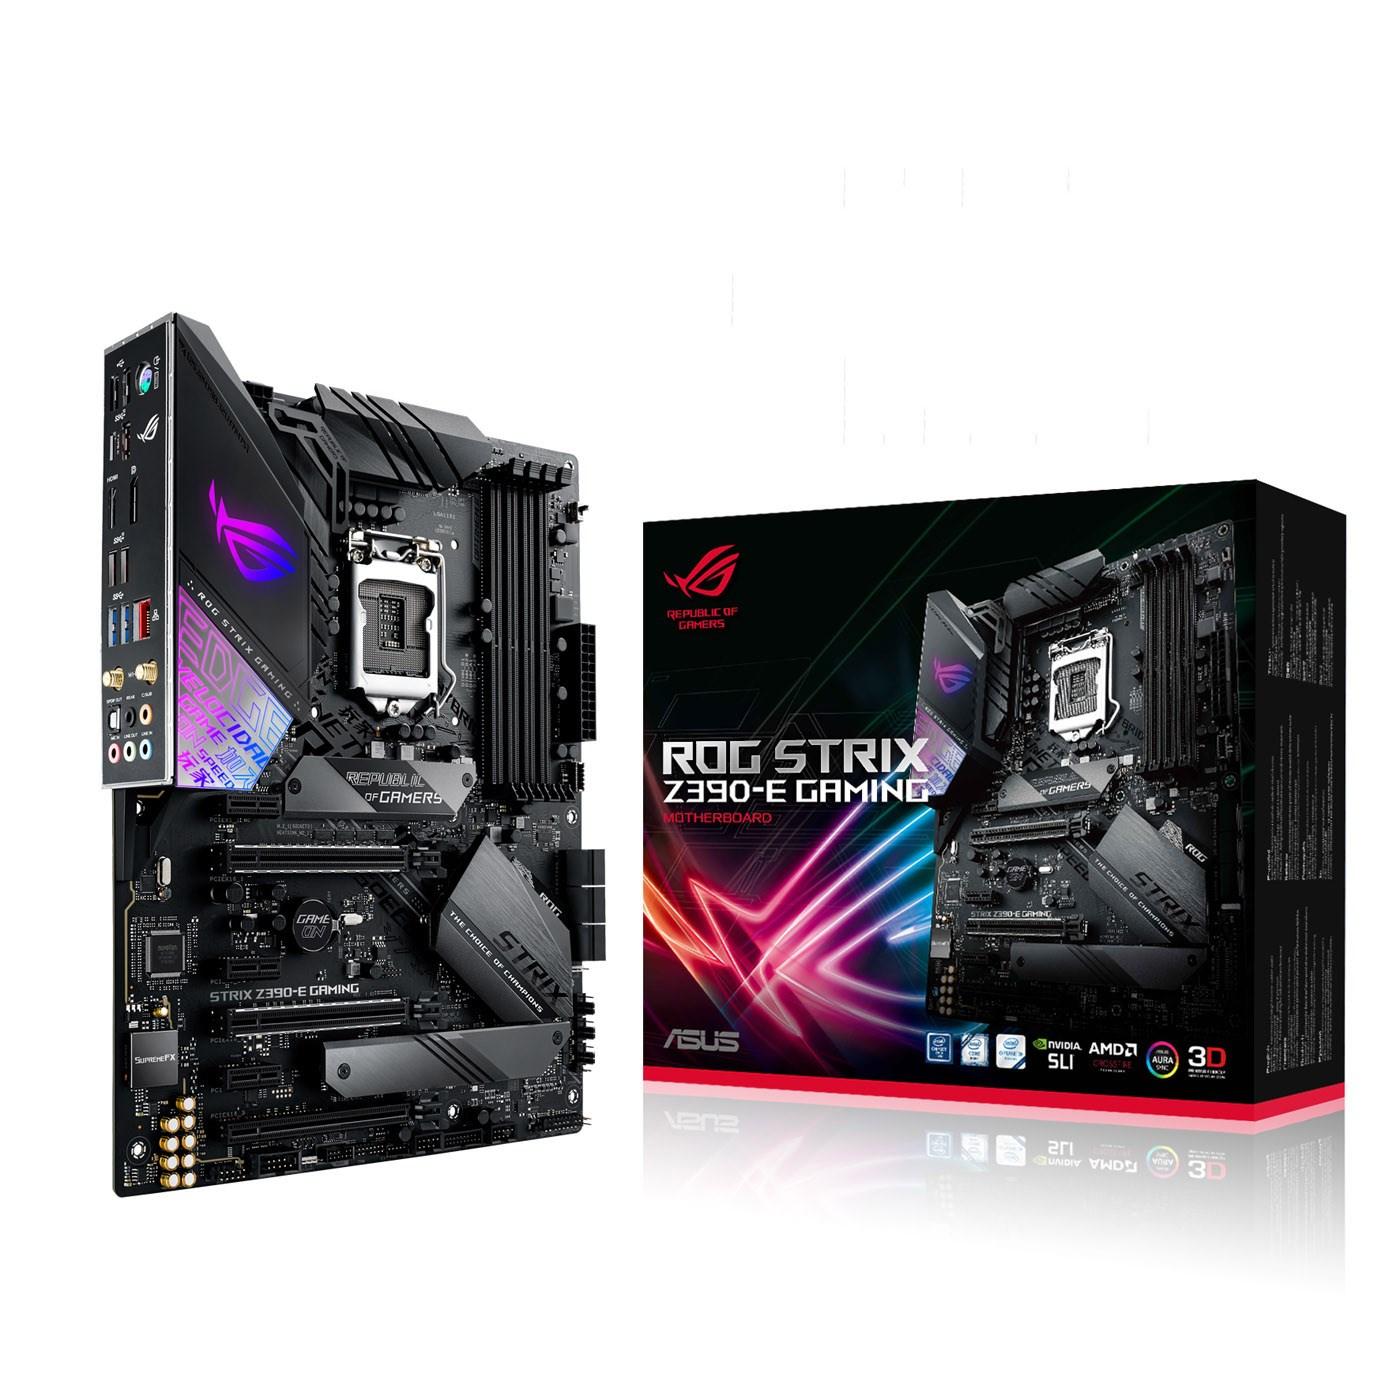 ASUS ROG STRIX Z390-E GAMING ATX Motherboard for Intel LGA1151 CPUs